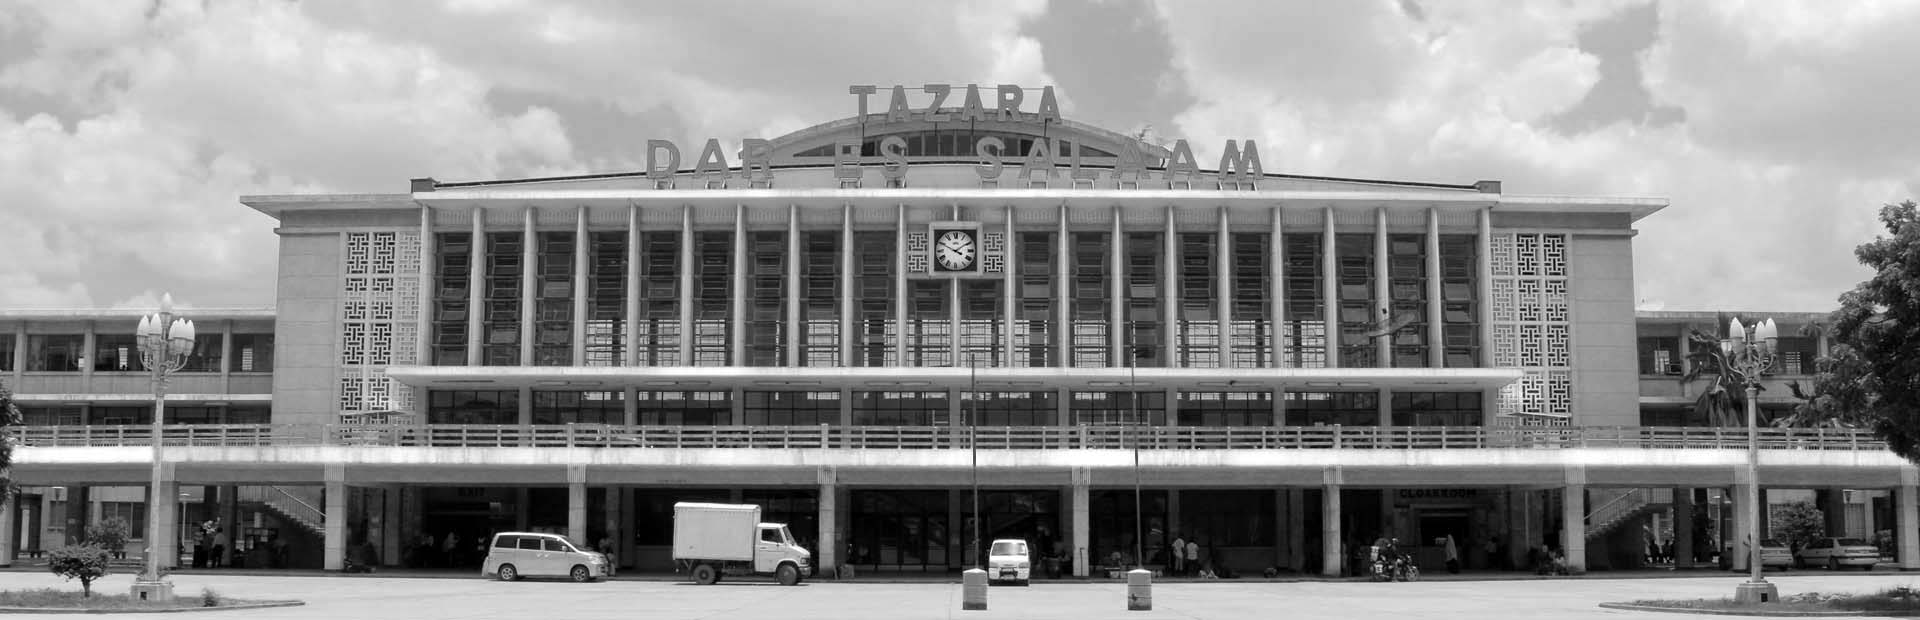 TAZARA station in Dar es salaam